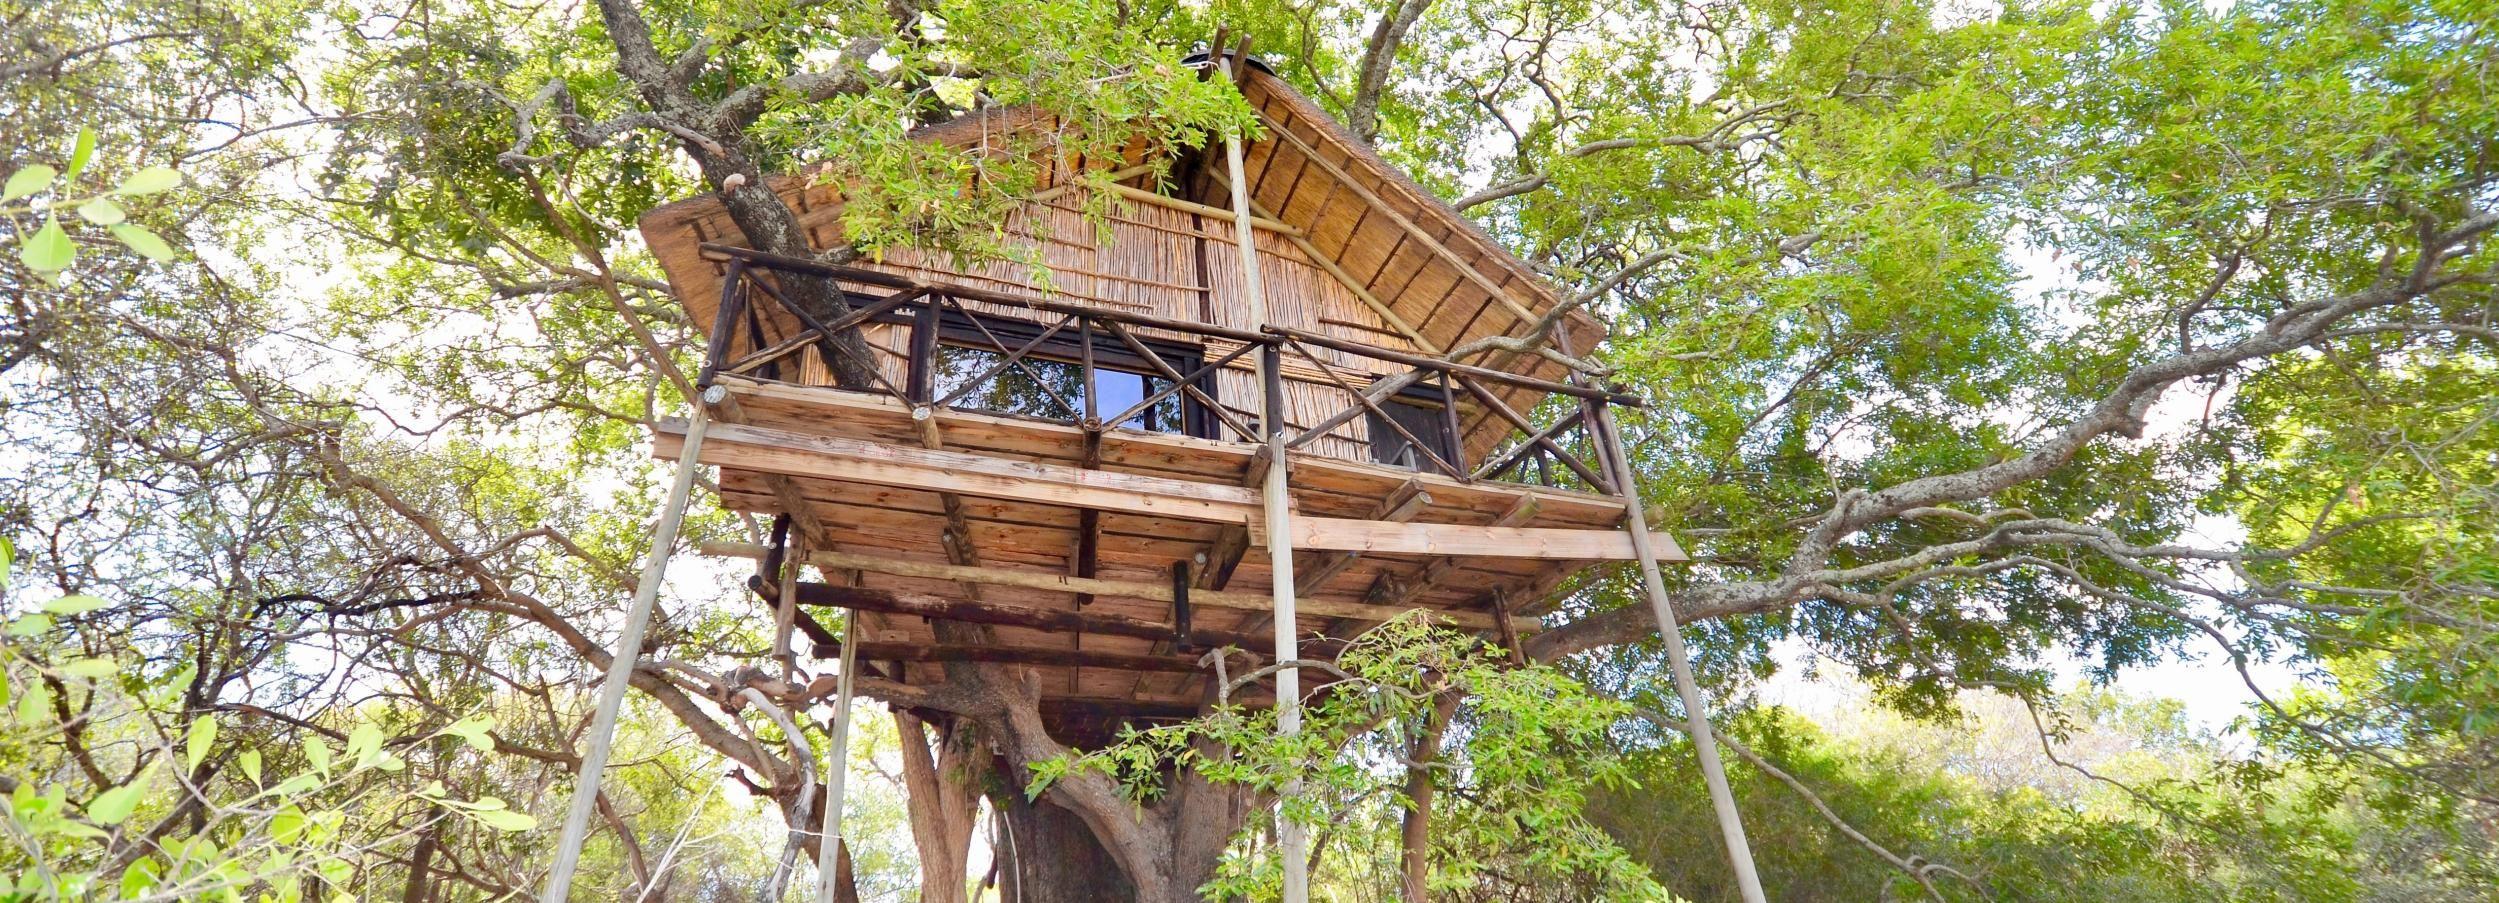 Kruger-Nationalpark: 3-tägige Safari mit Baumhausaufenthalt